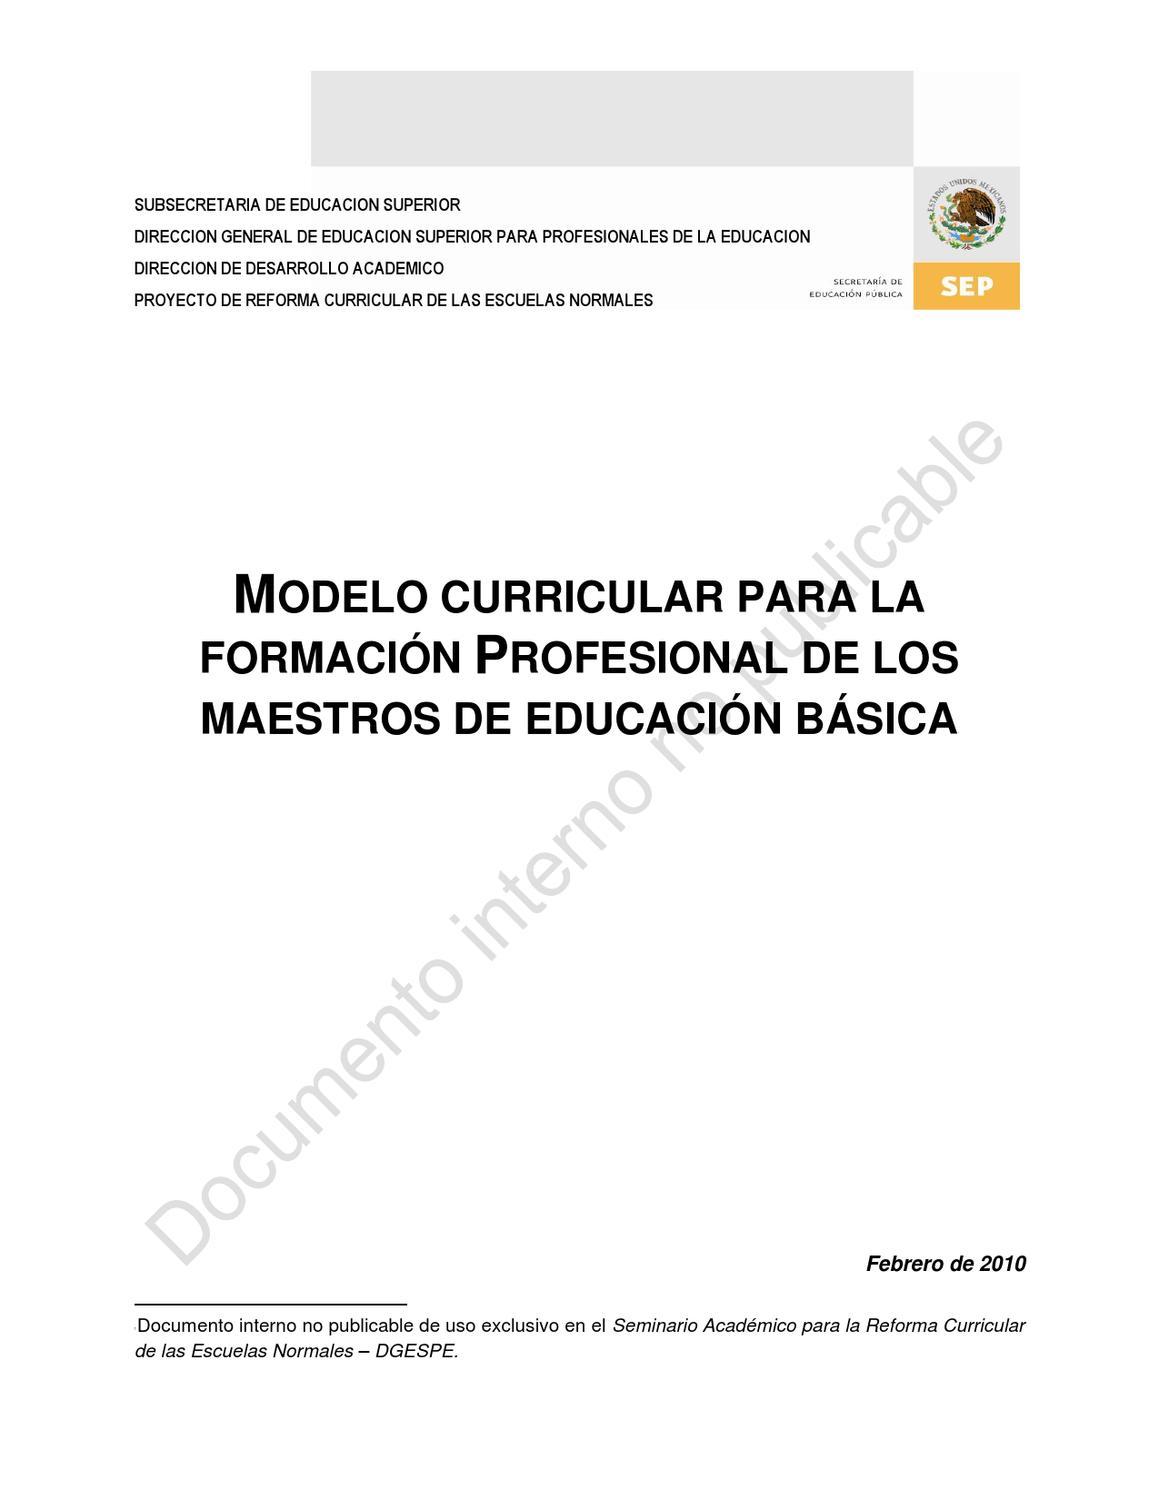 Modelo curricular marzo 2010 by Abel Sanchez Escamilla - issuu